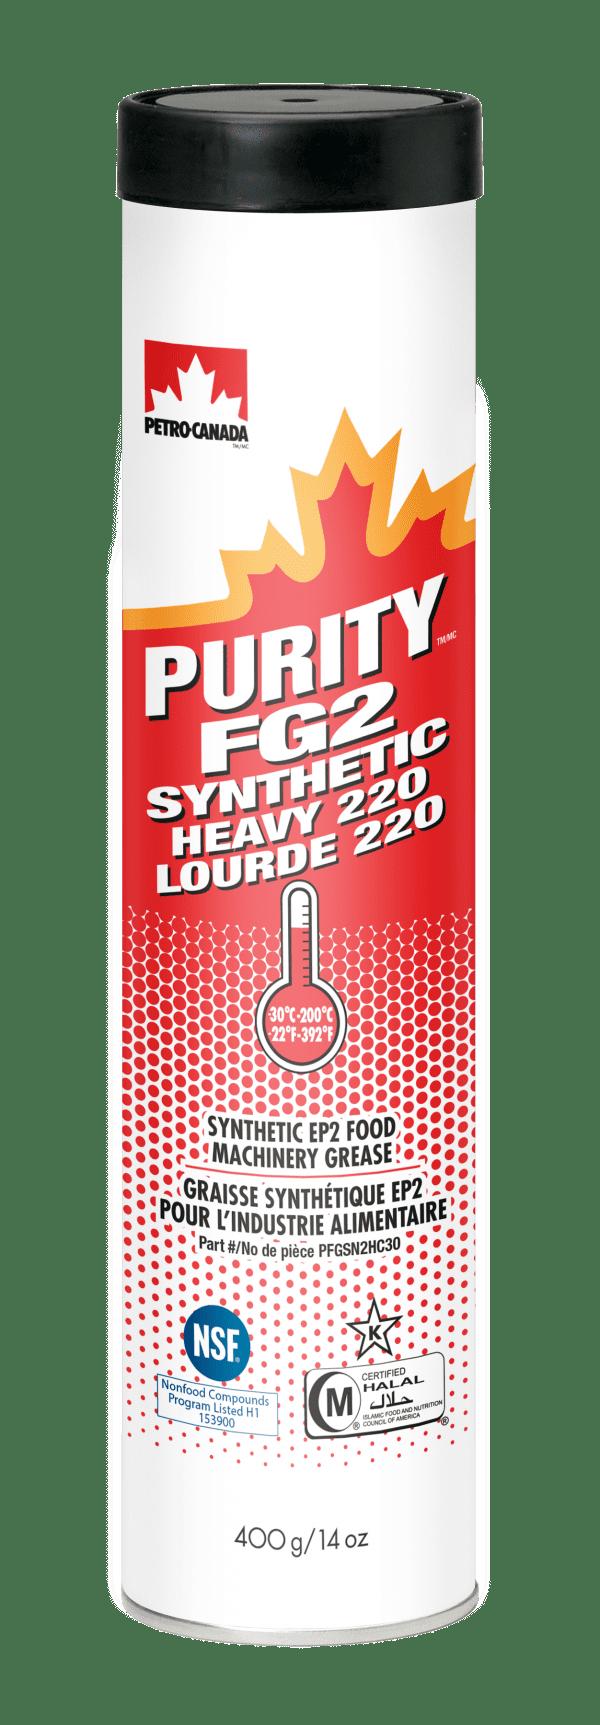 Purity FG2 Synthetic Heavy 220